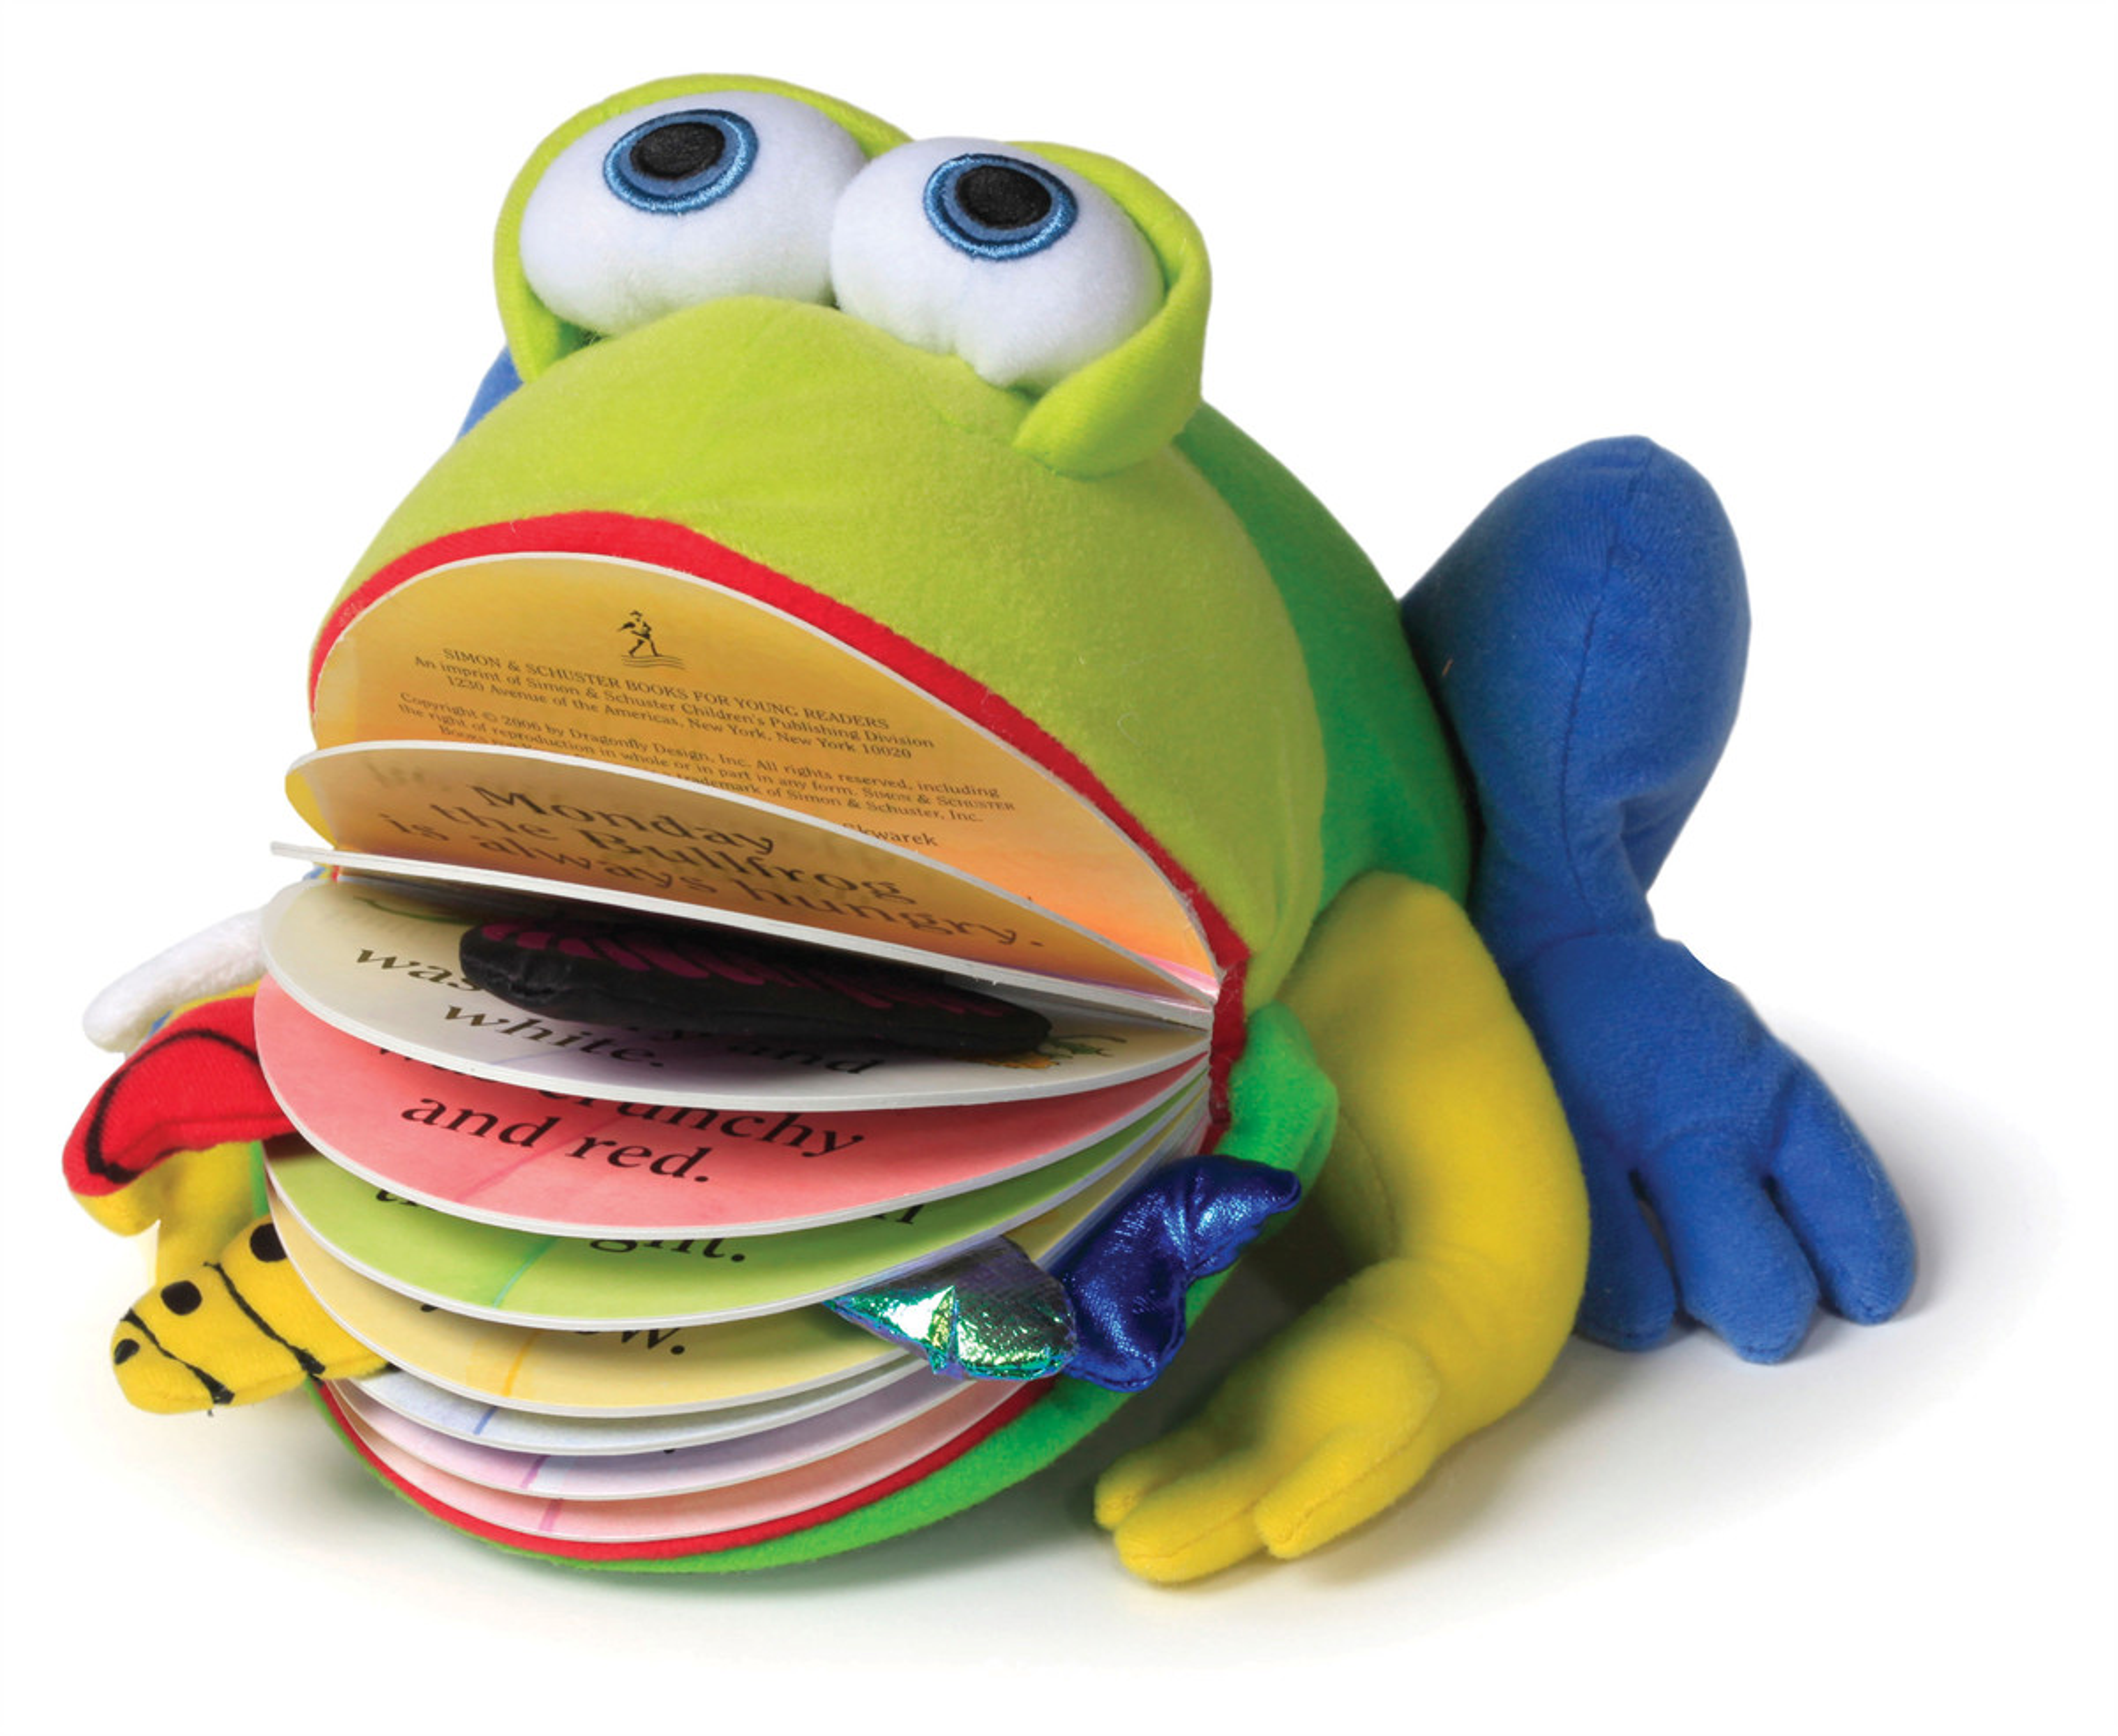 Monday the bullfrog 9781442409583.in01